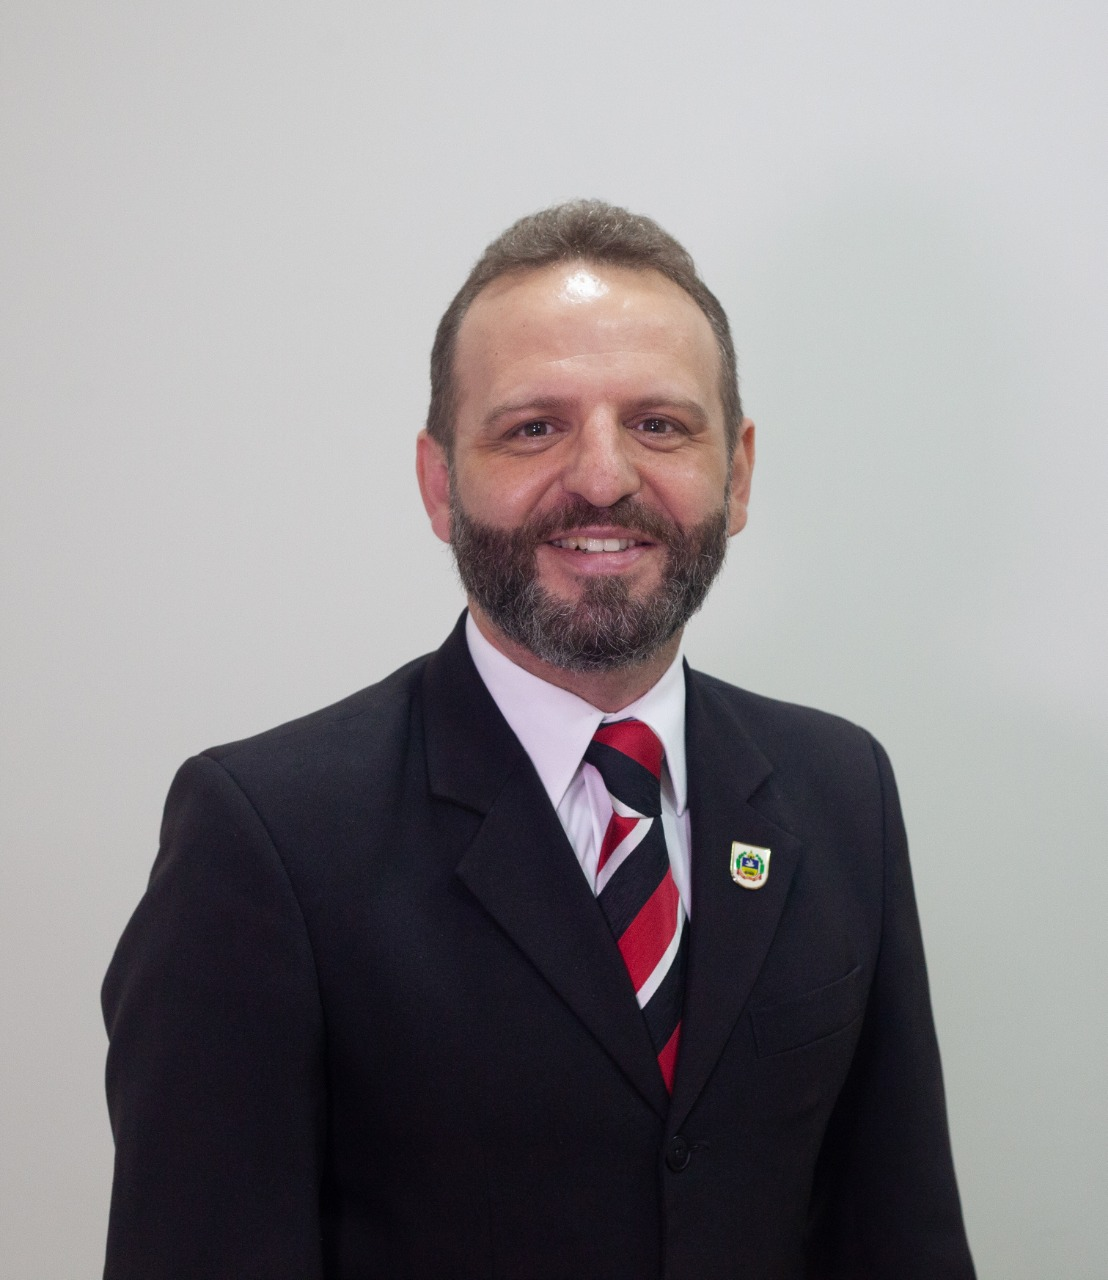 Ver. Juliano Muller de Oliveira (PSB)